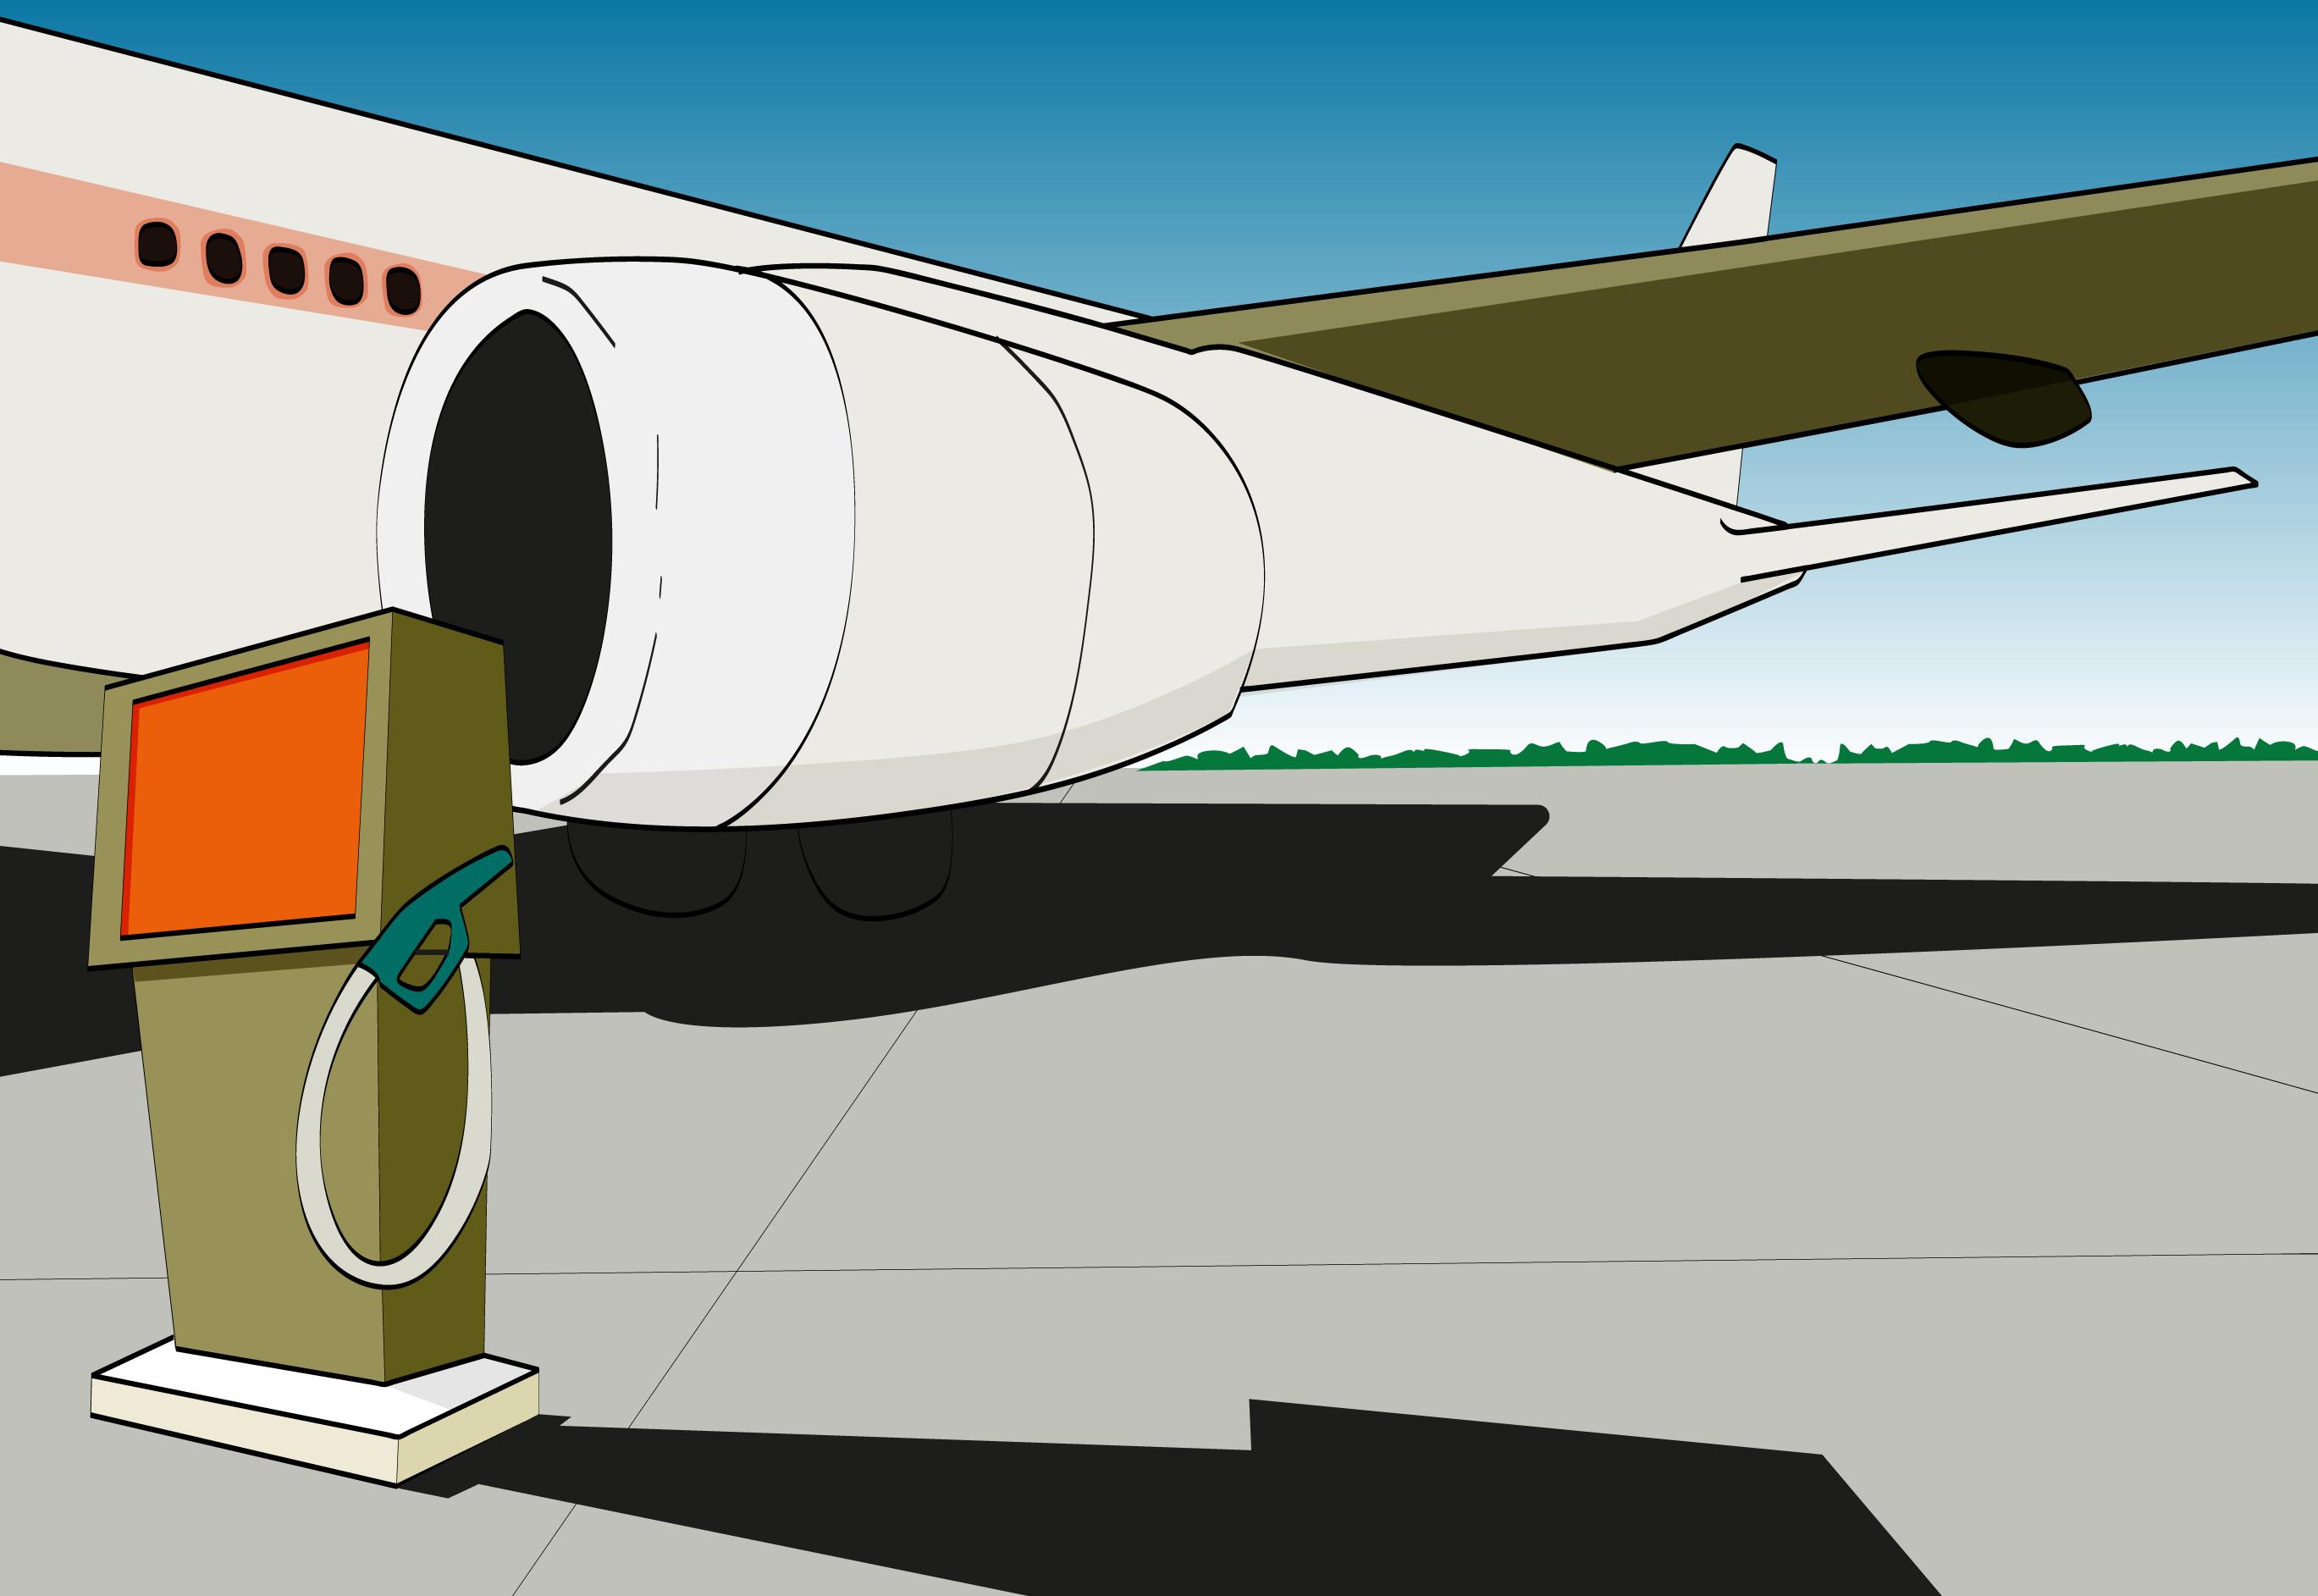 ilustra chumbo gasolina